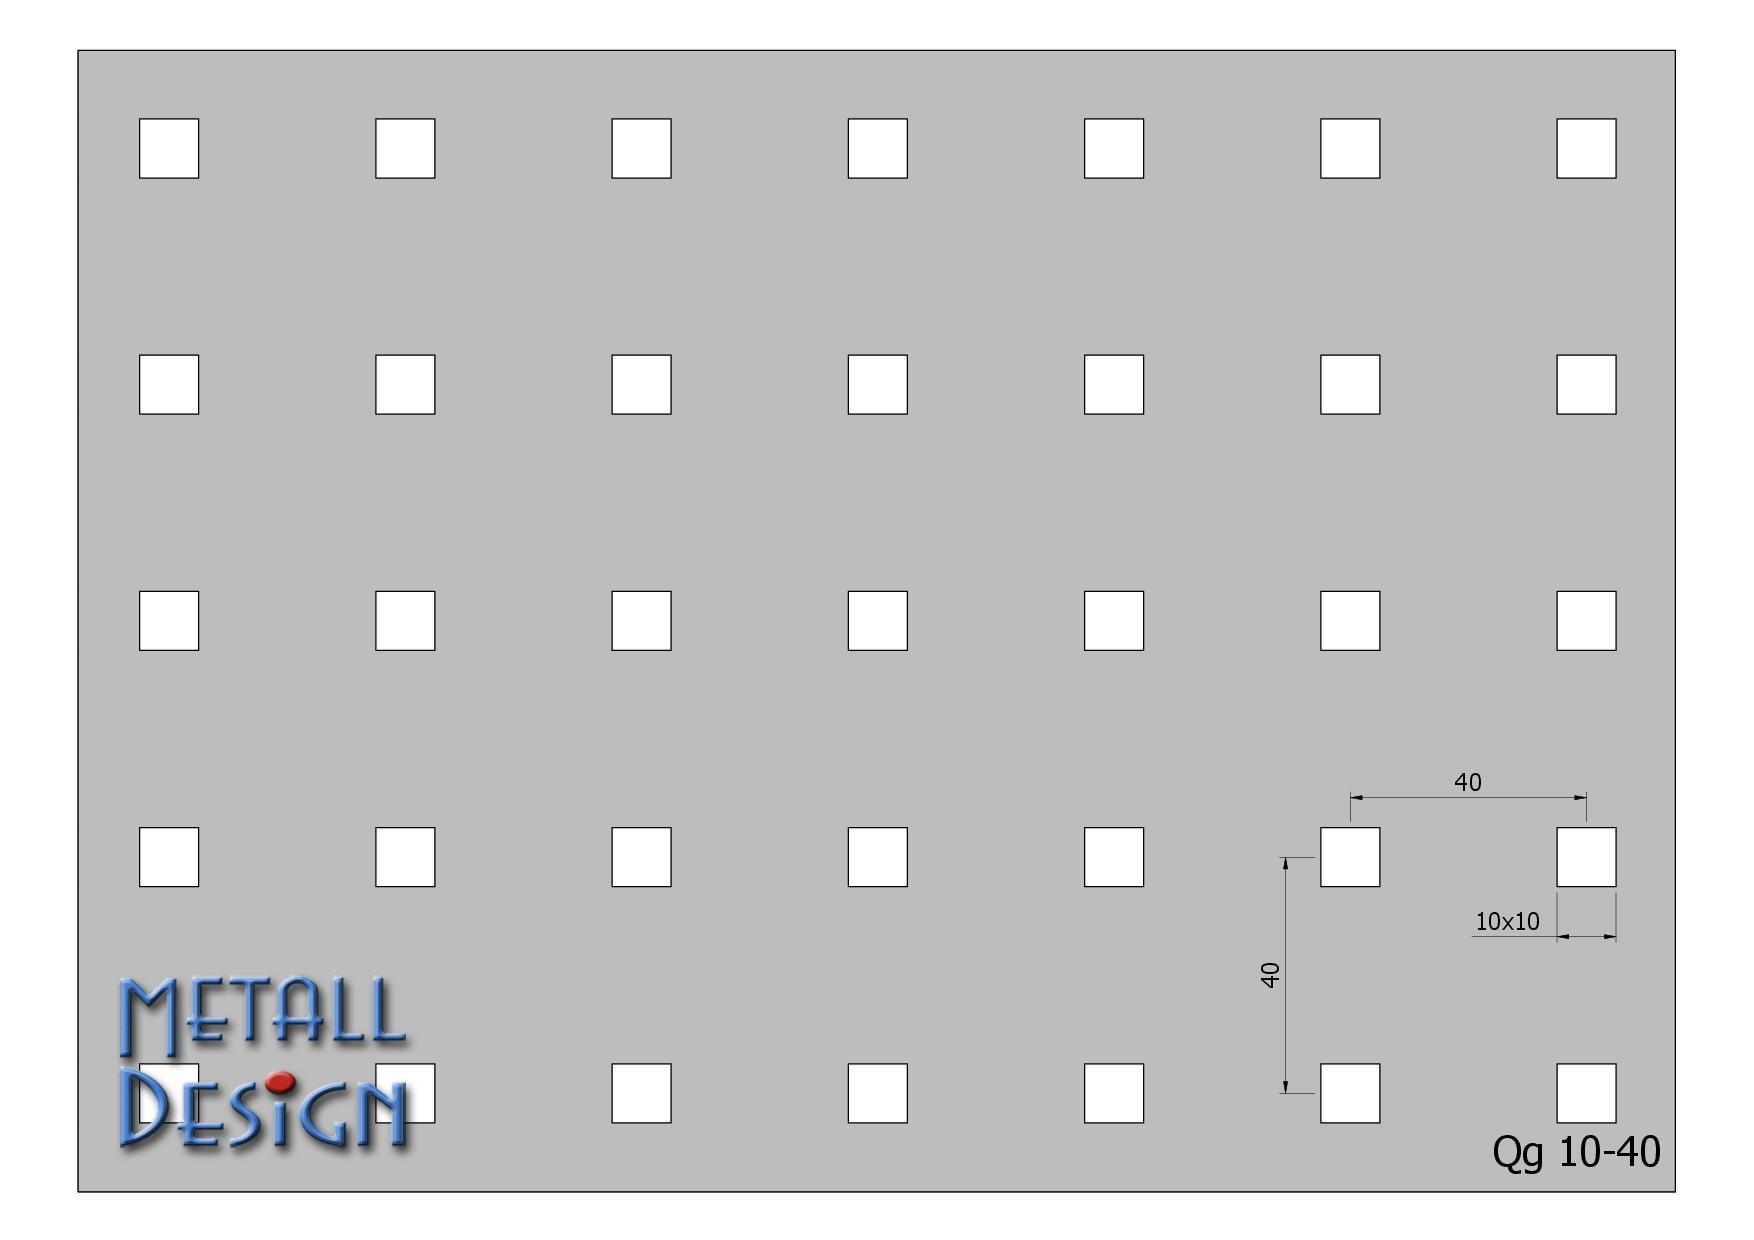 lochblech edelstahl qg 10 40 design shop baalcke ihr handlauf gel nder und edelstahlrohr shop. Black Bedroom Furniture Sets. Home Design Ideas